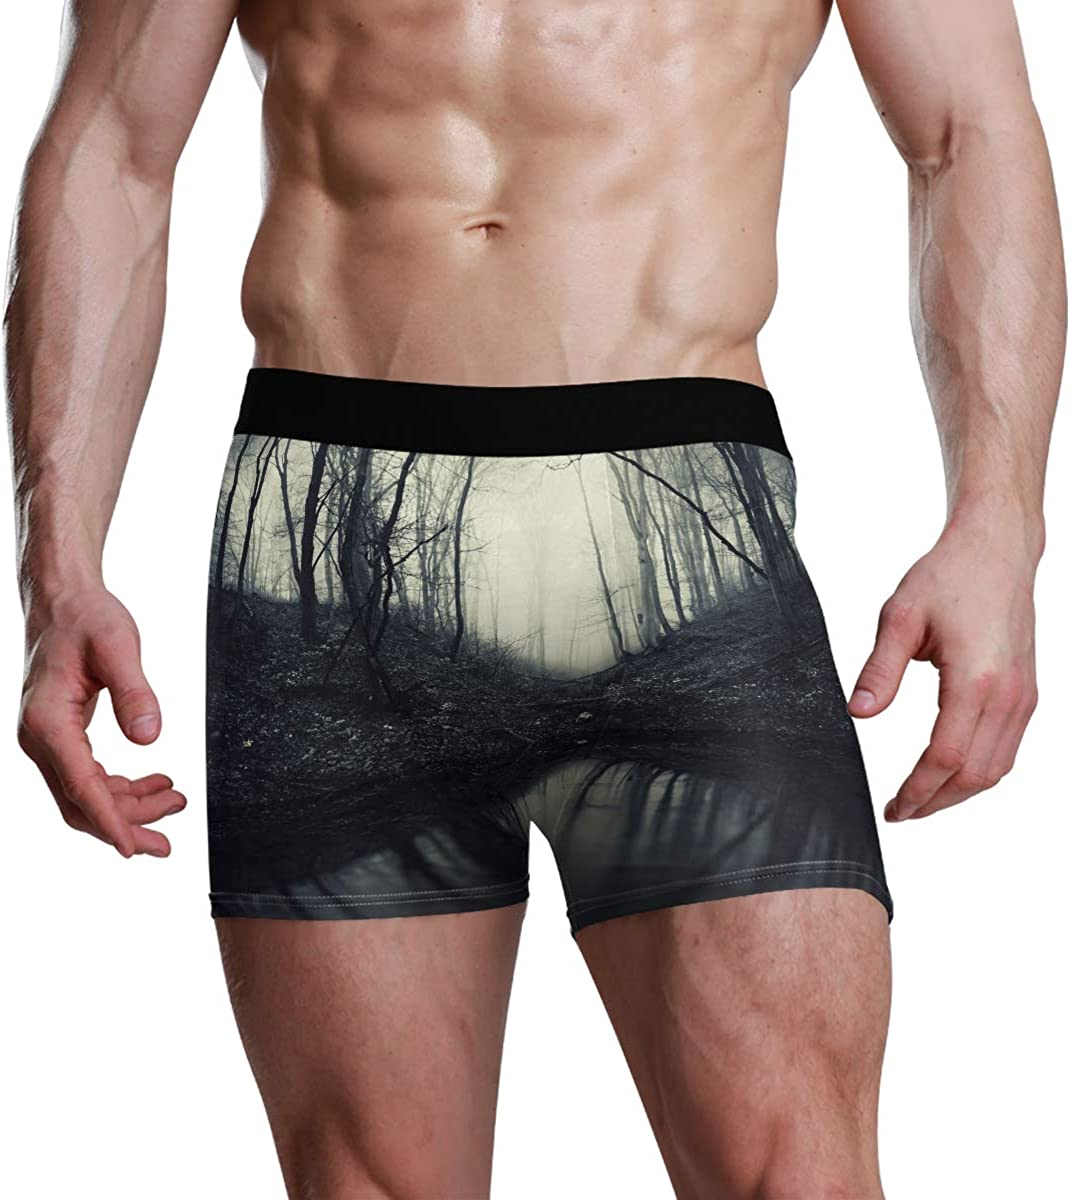 Mens Underwear Boxers Forest Reflection in Dark Water ComfortSoft Boxer Briefs Breathable Bikini